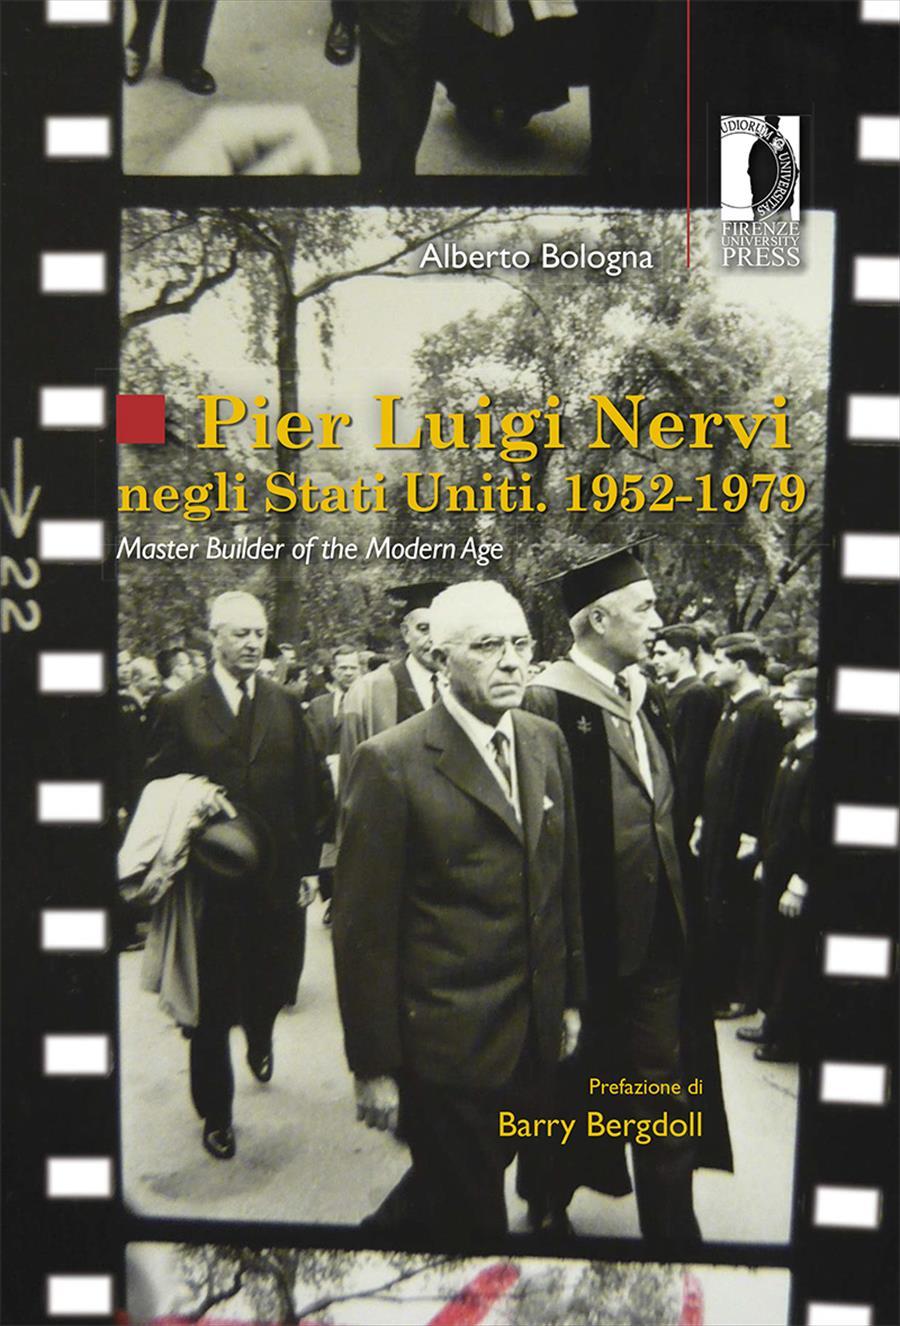 Pier Luigi Nervi negli Stati Uniti. 1952-1979